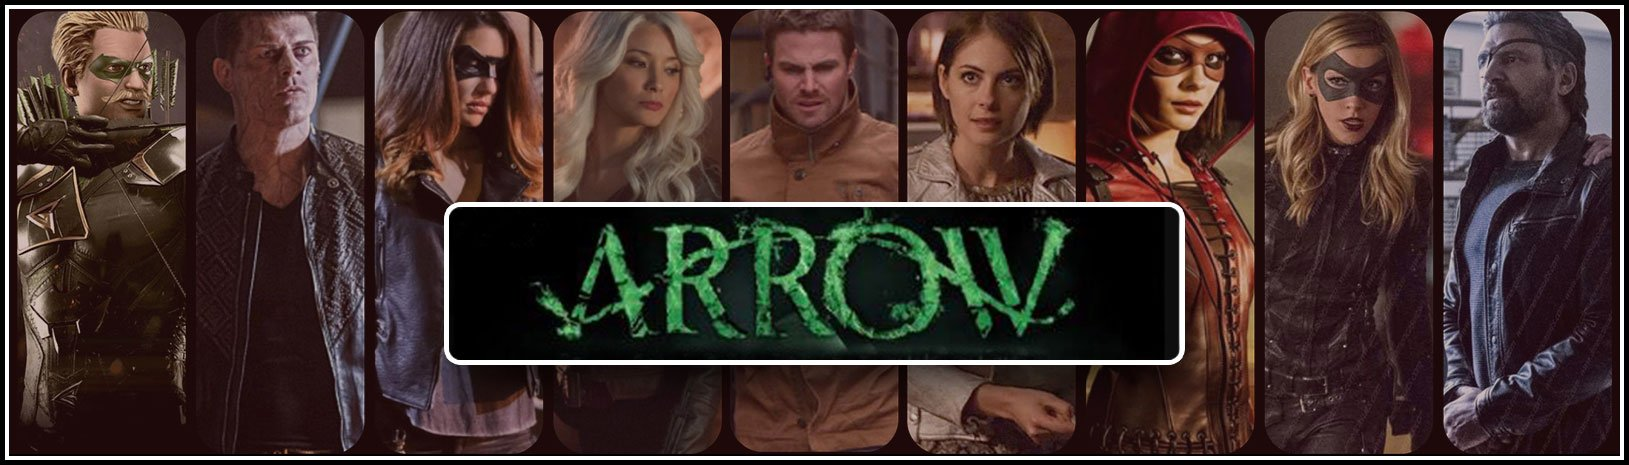 Arrow Merchandise